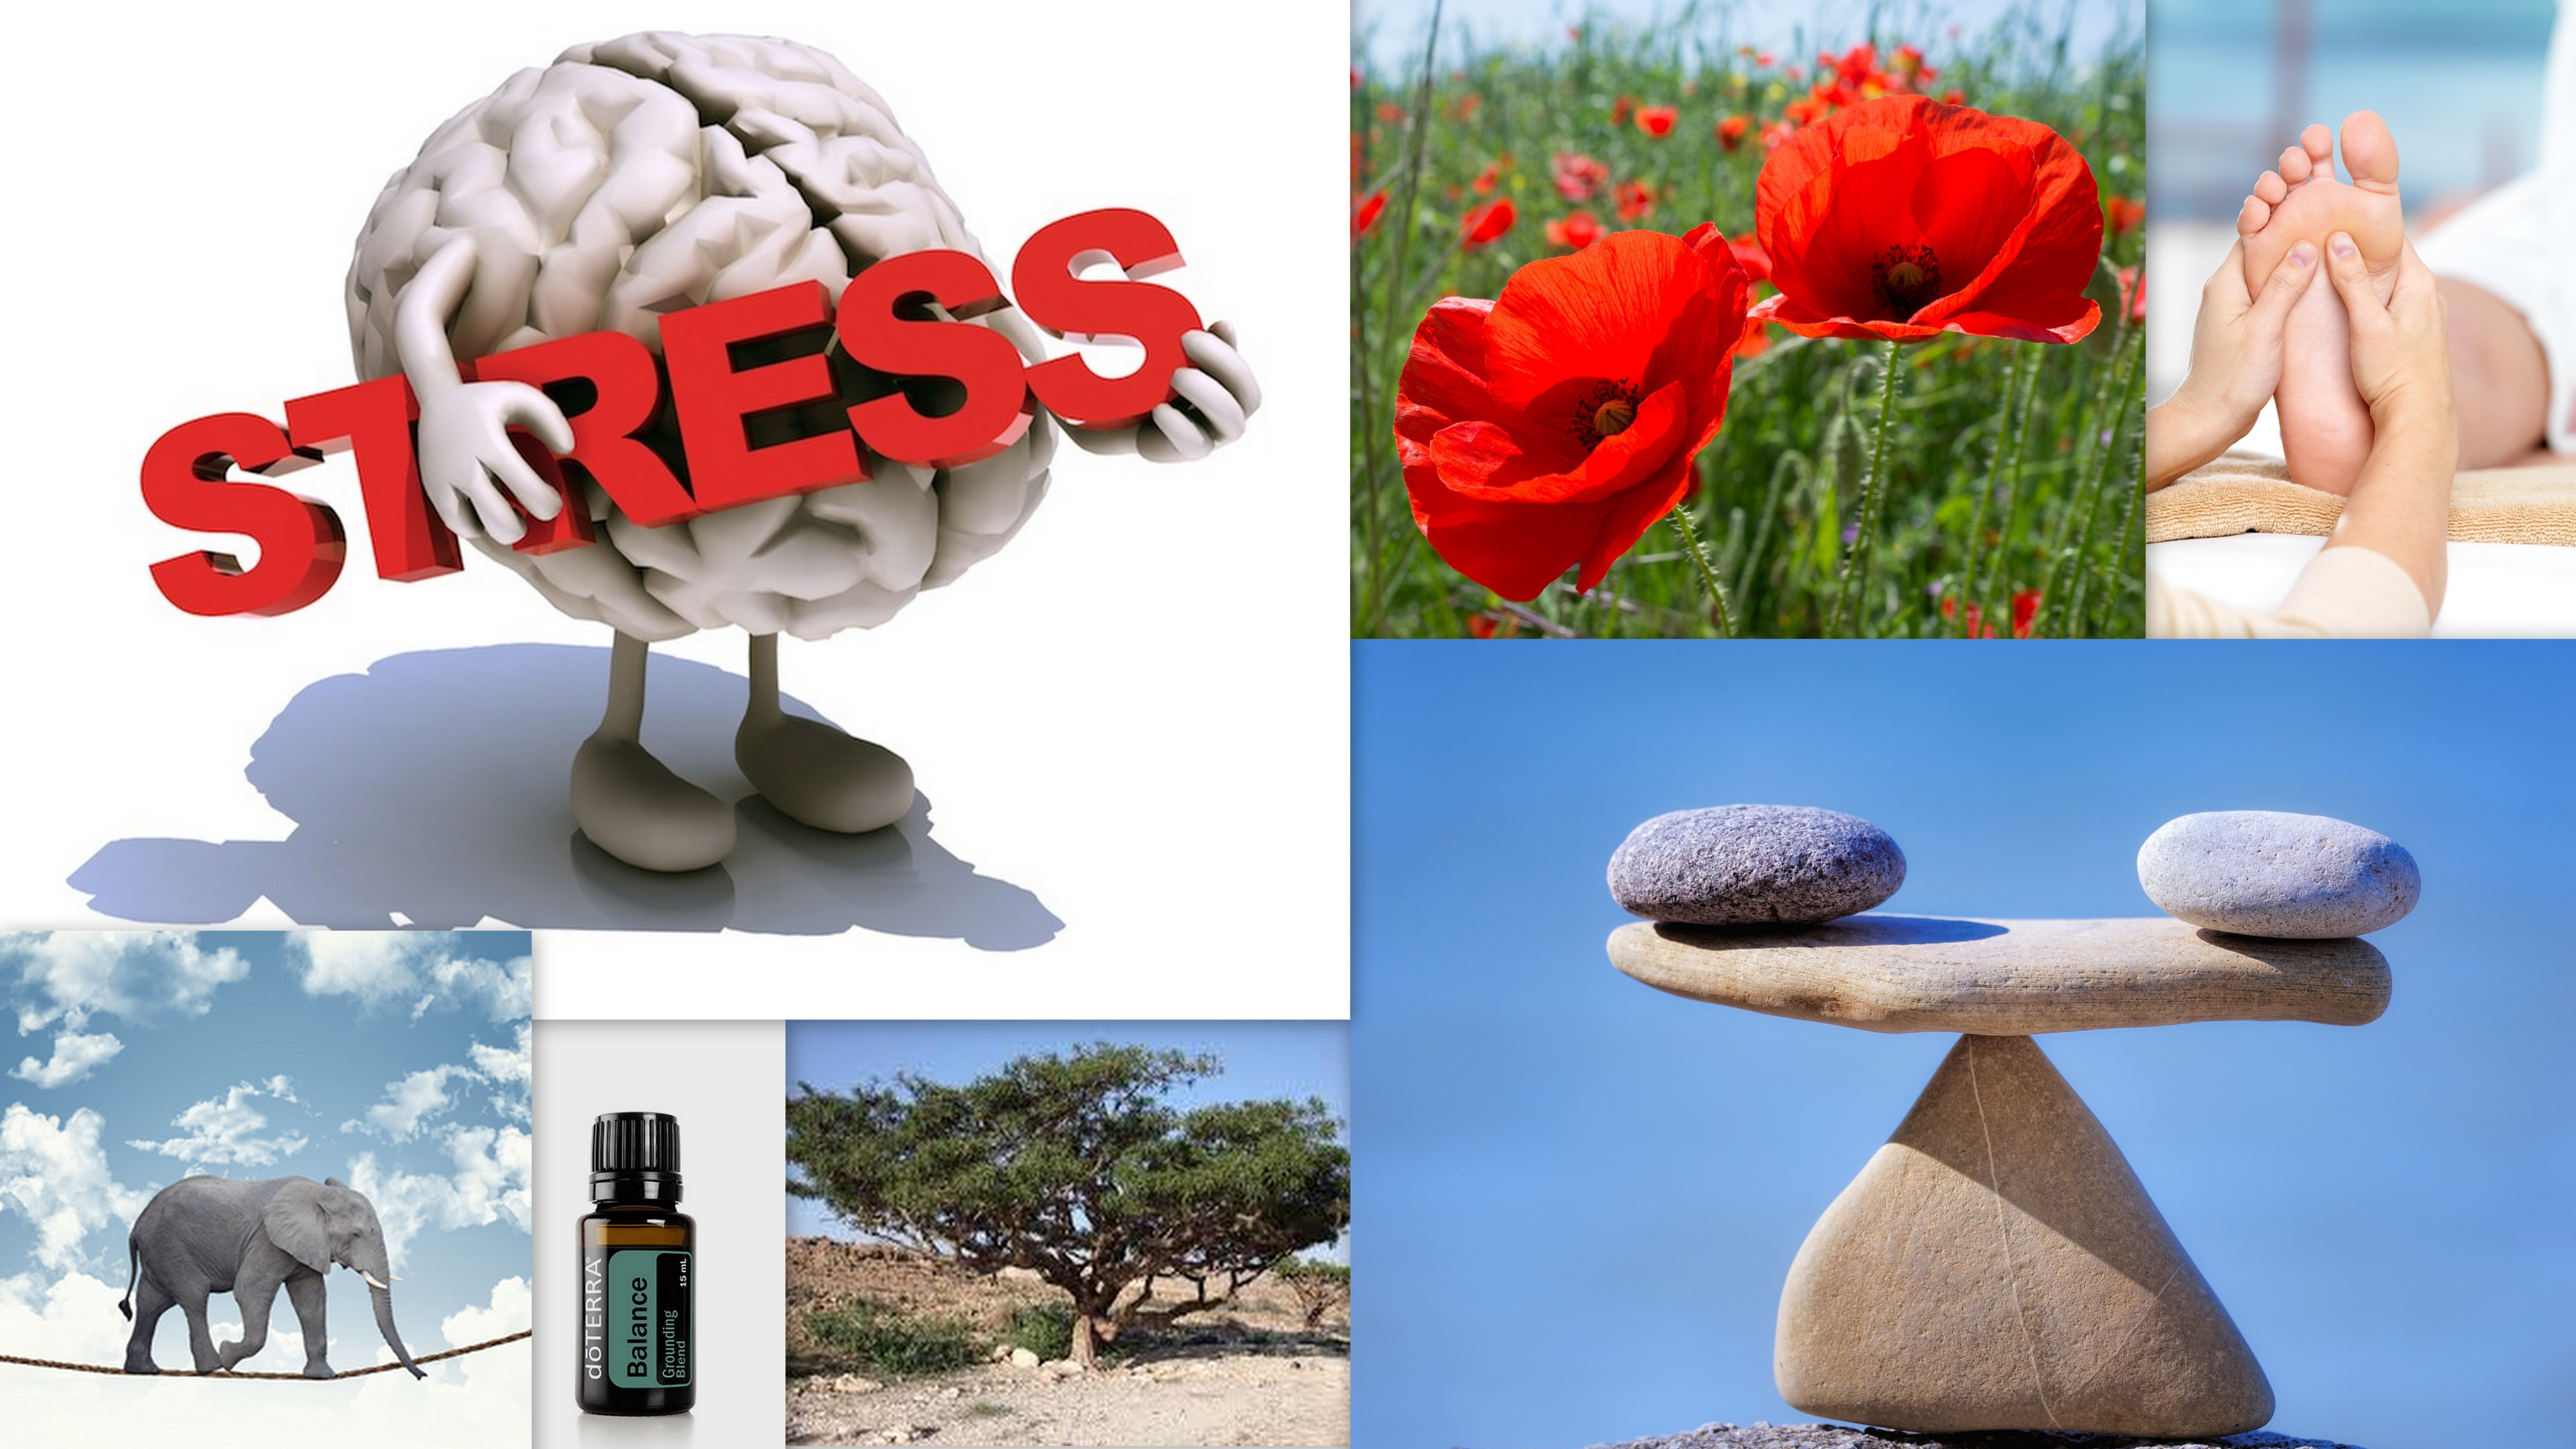 Voetreflexologie en stress